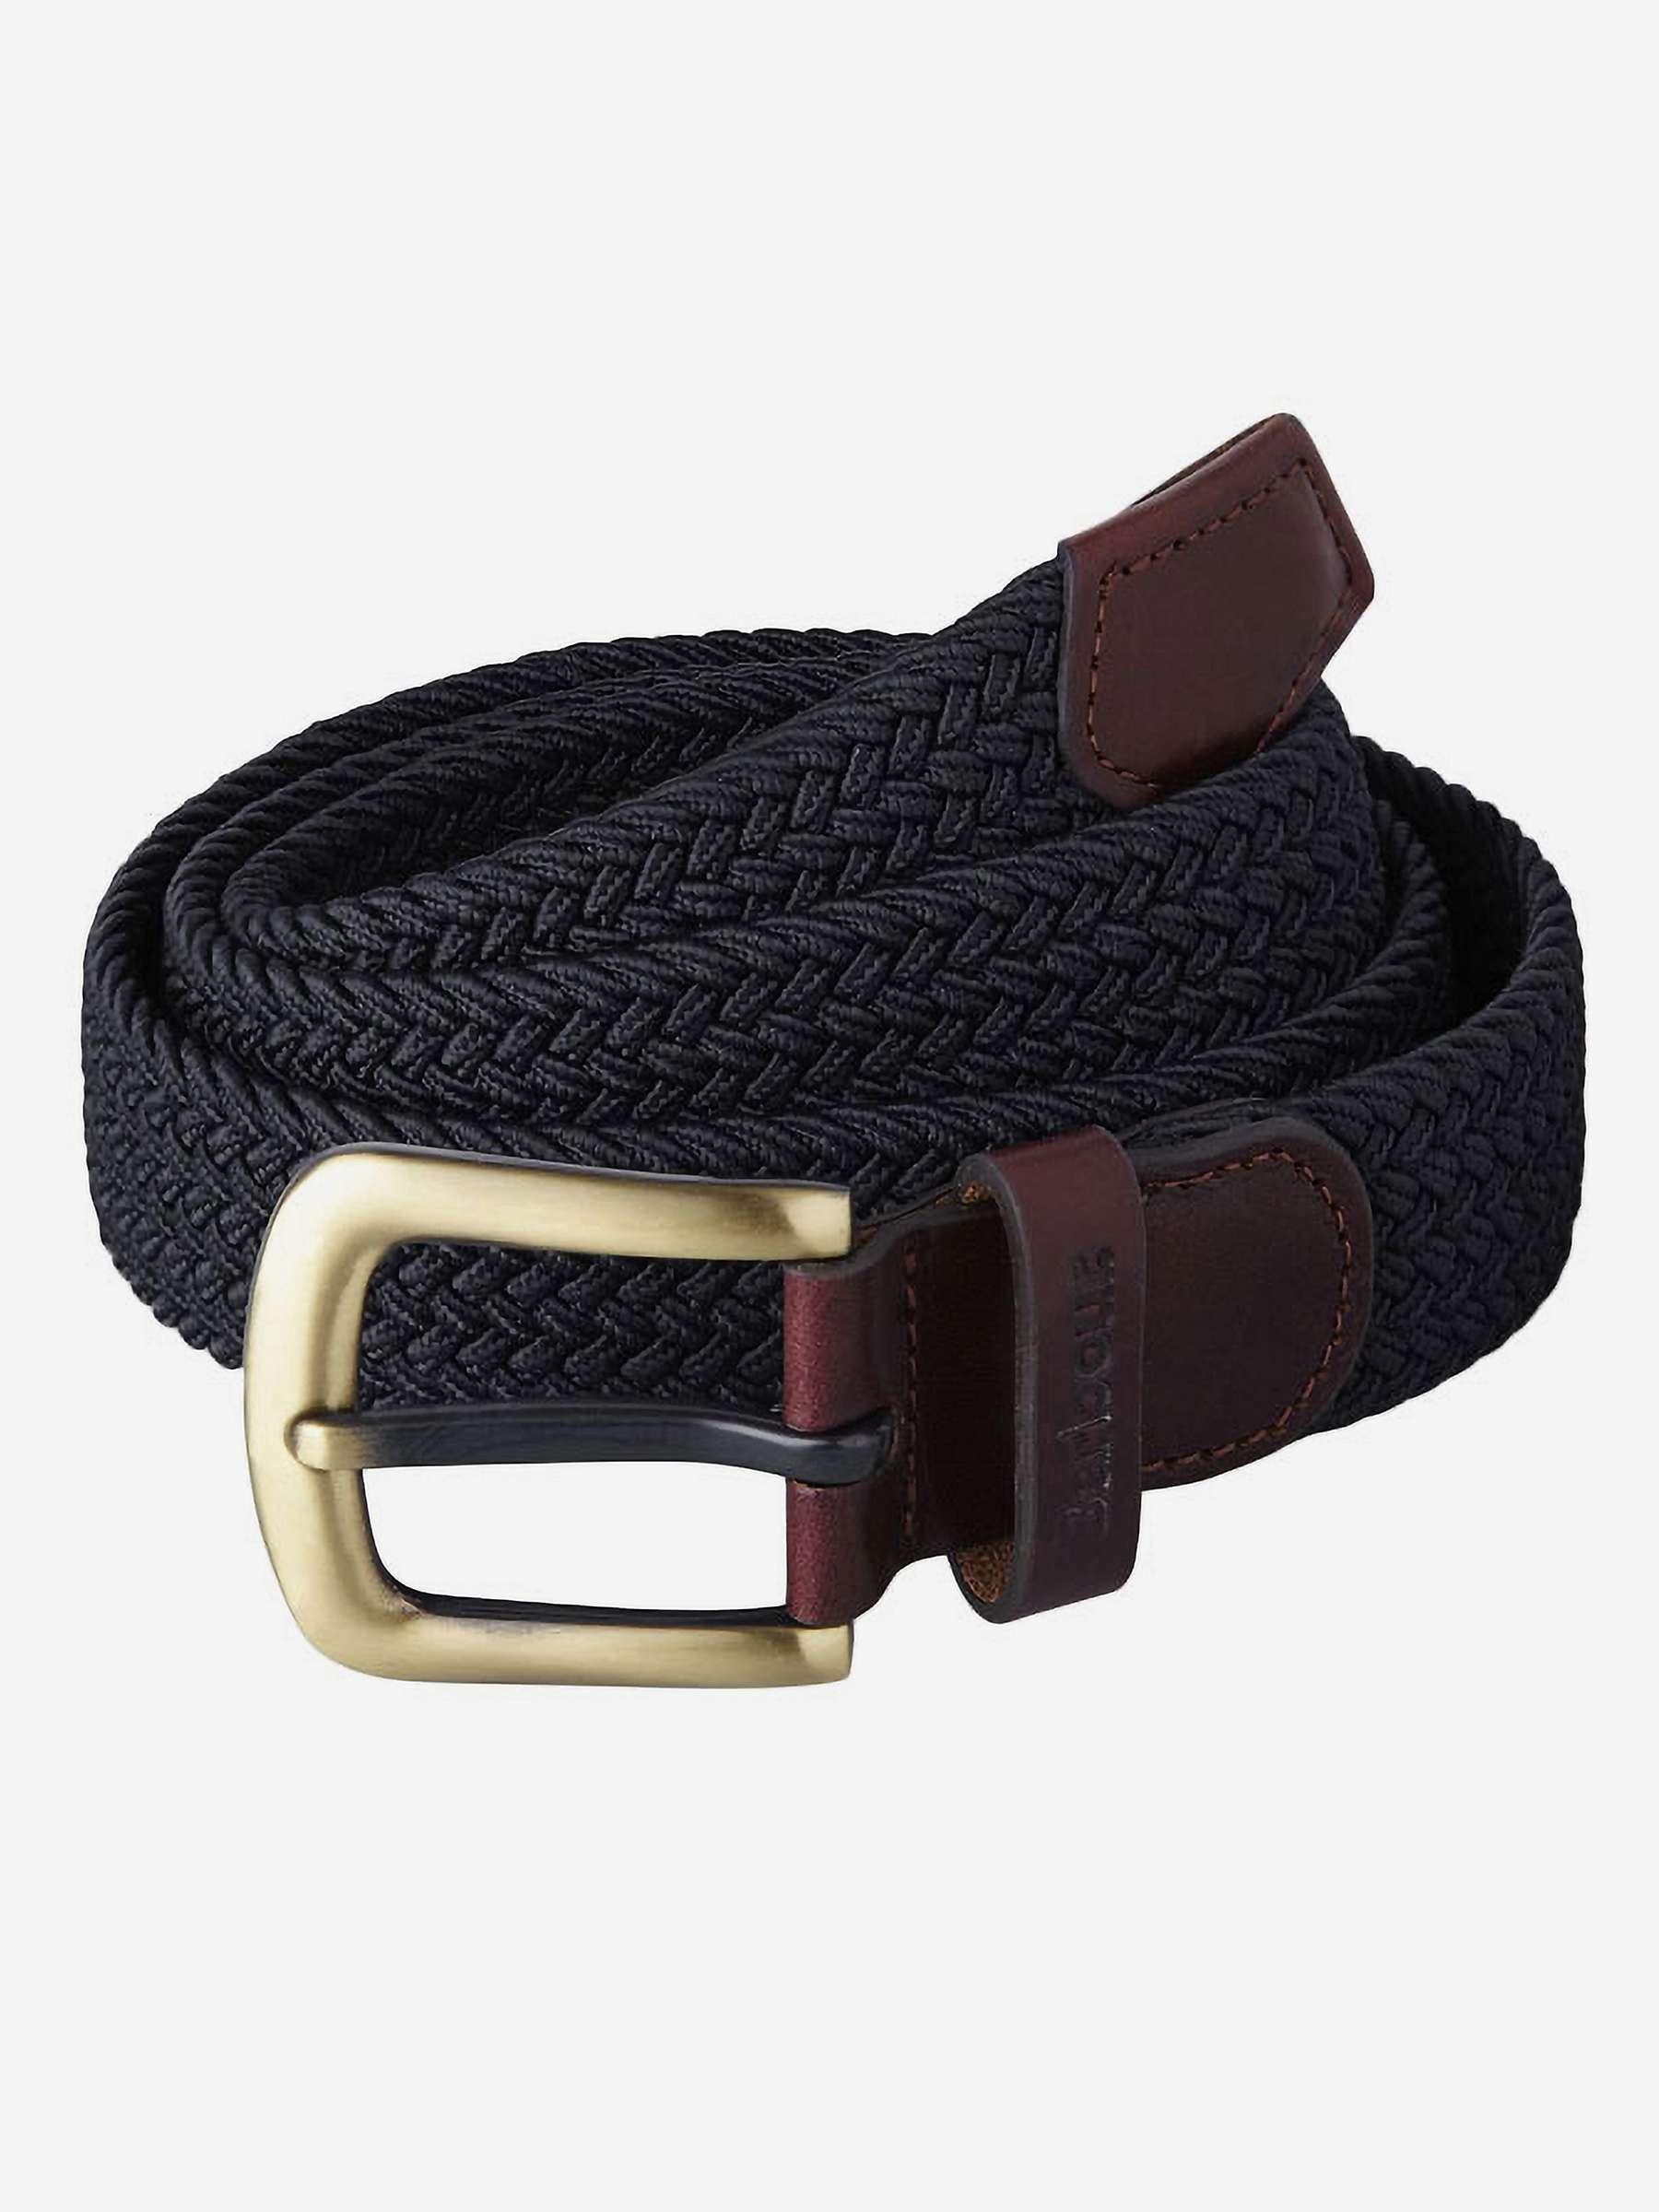 Barbour Webbing Leather Trim Belt, Navy by John Lewis